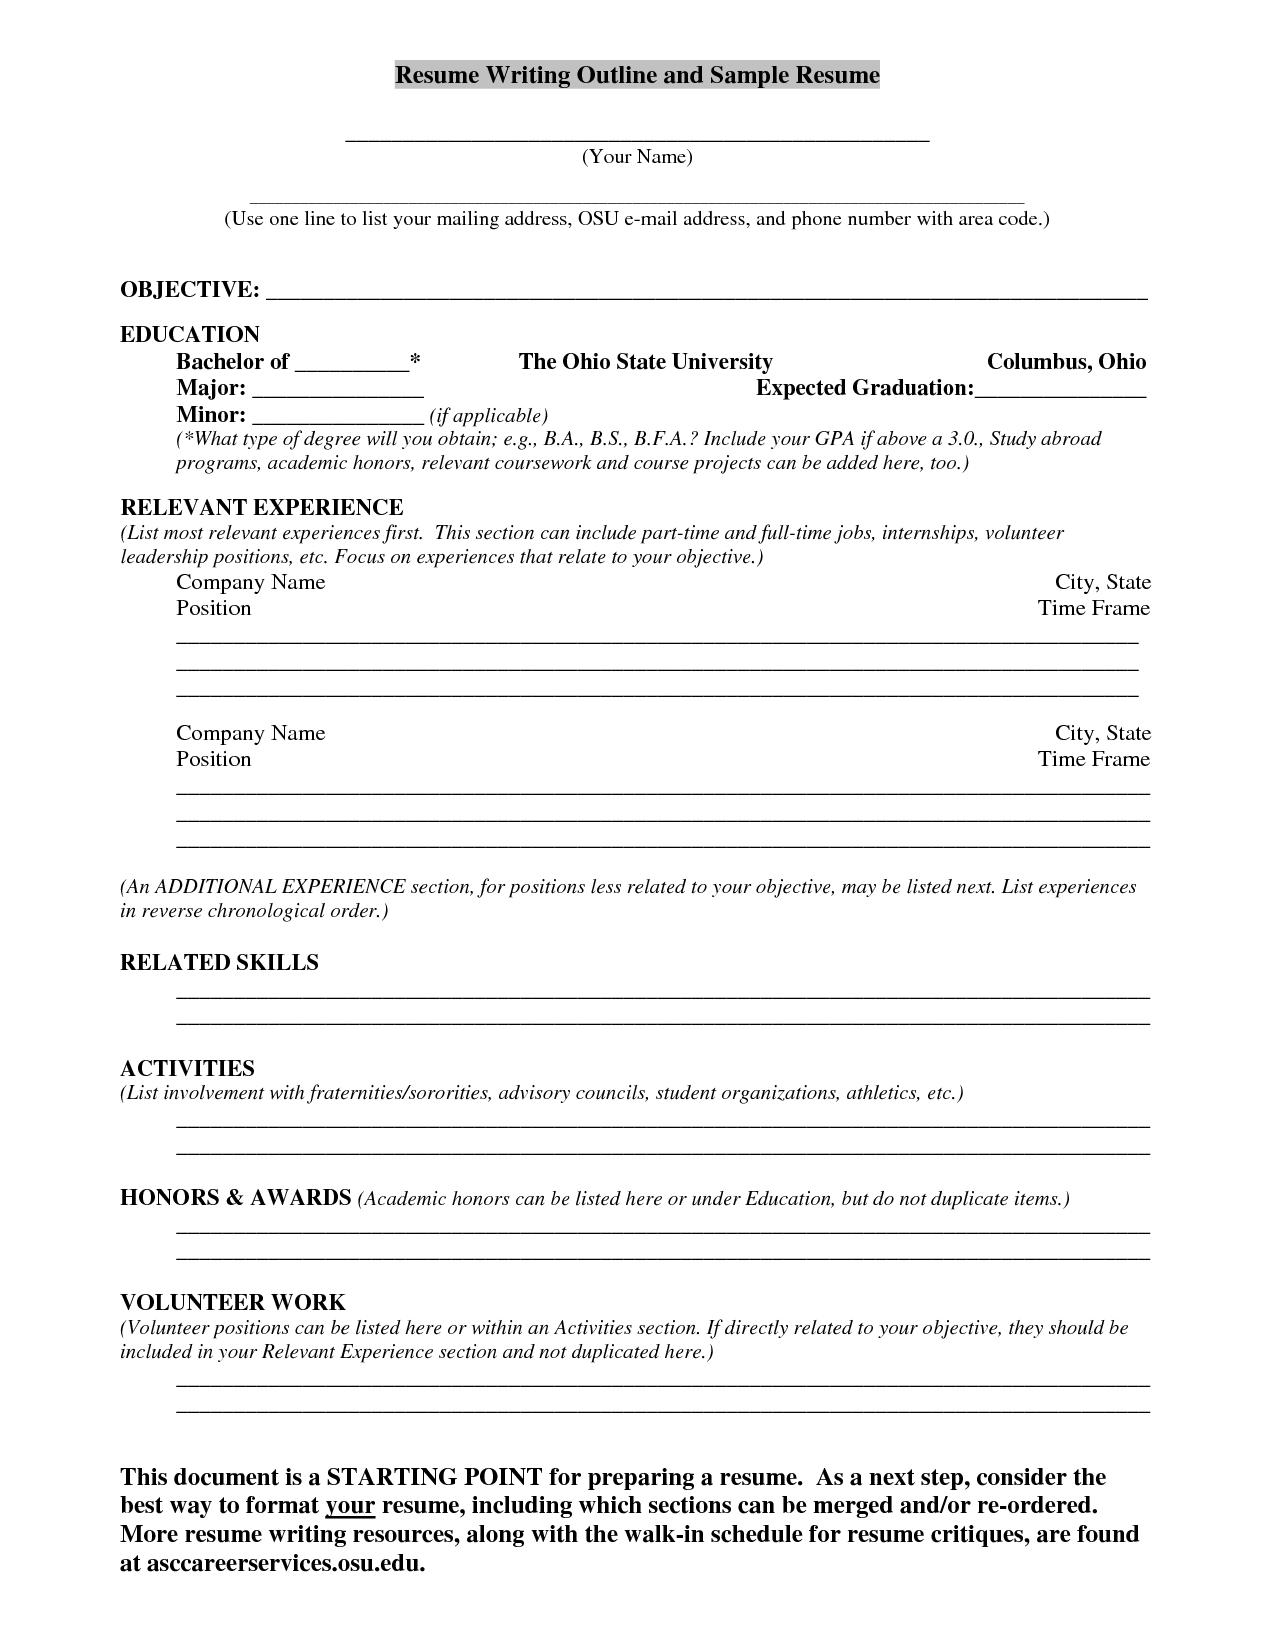 Resume Writing Outline and Sample Resume Resume writing